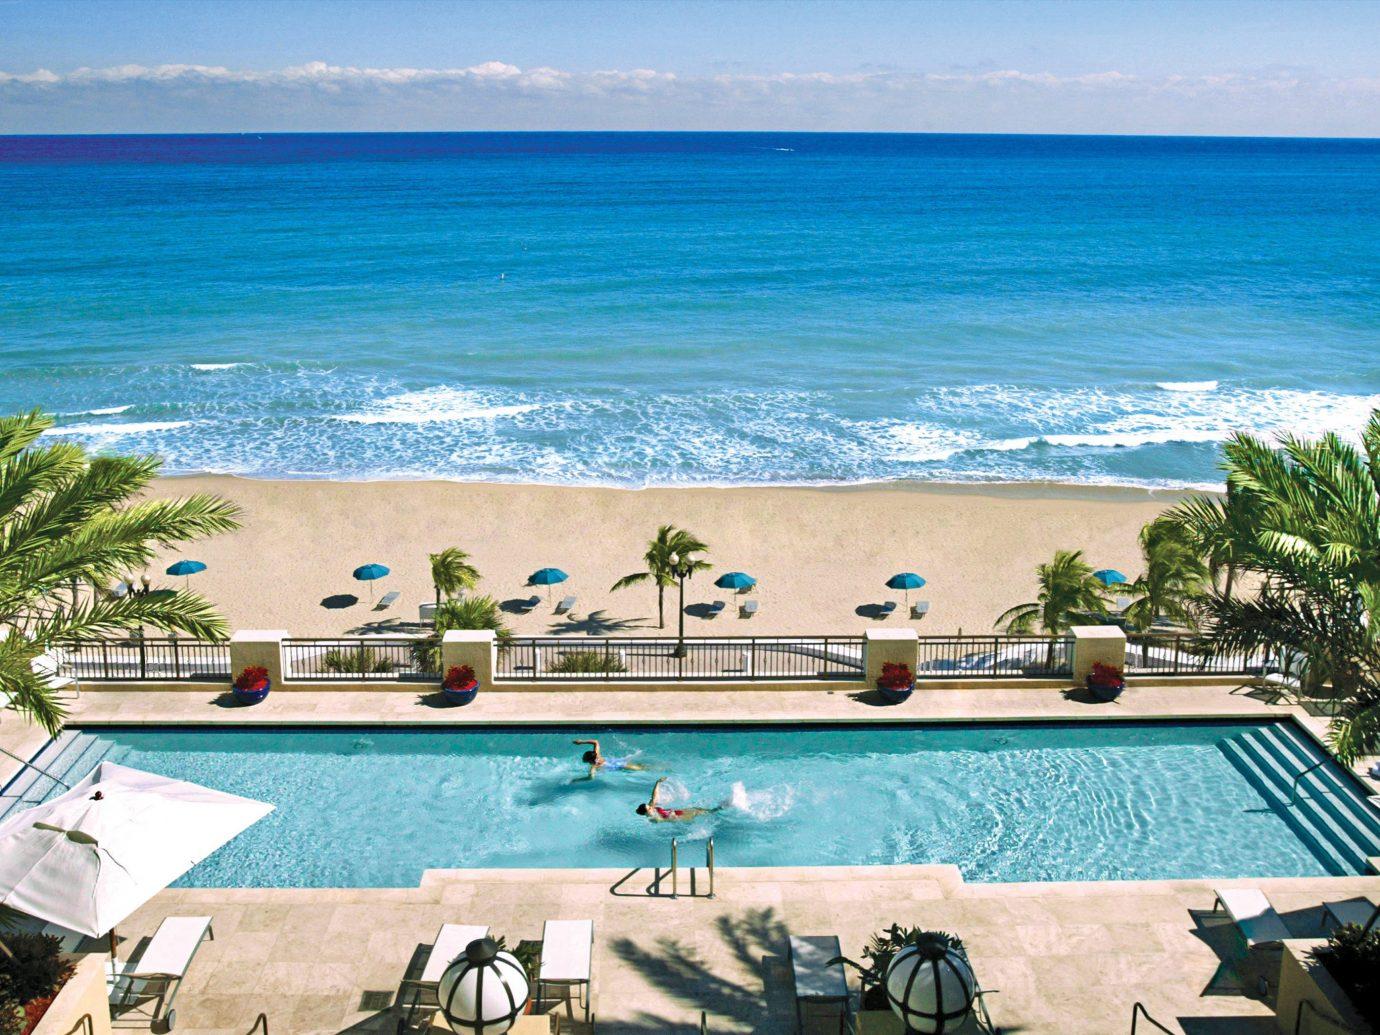 Trip Ideas water sky leisure swimming pool outdoor vacation caribbean Sea Ocean Resort estate Beach people bay Villa blue Deck shore swimming